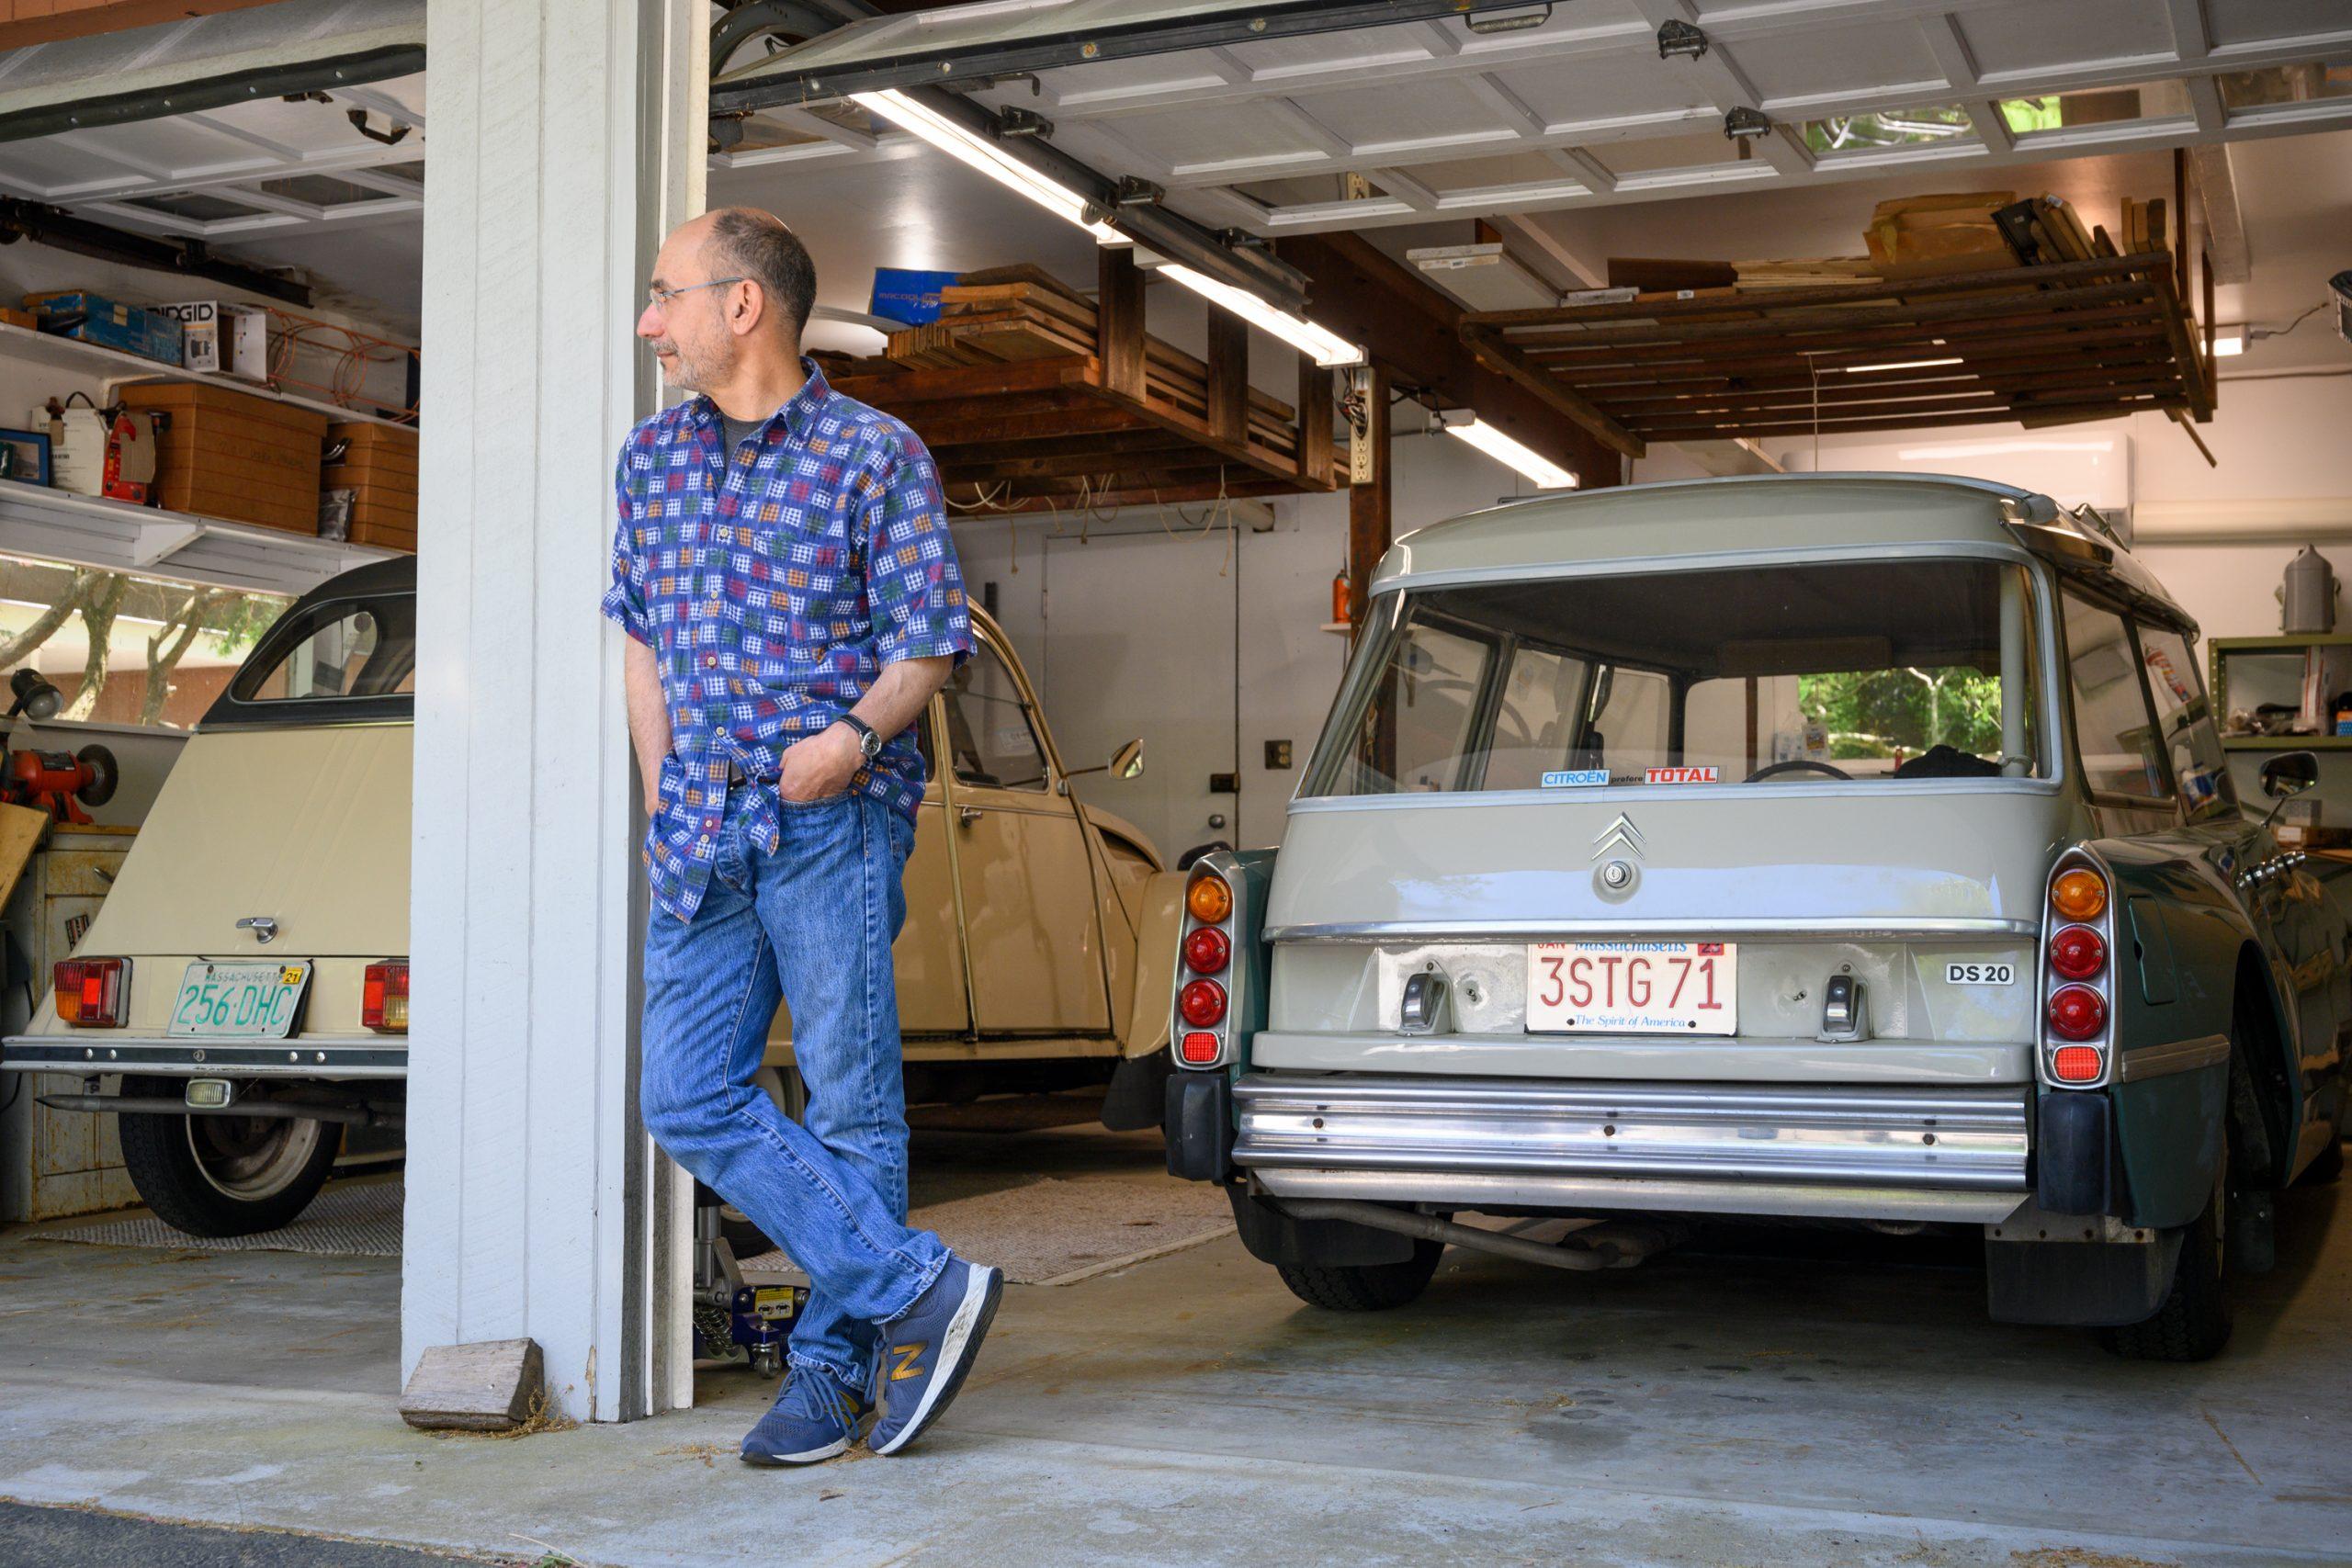 Citroen garage